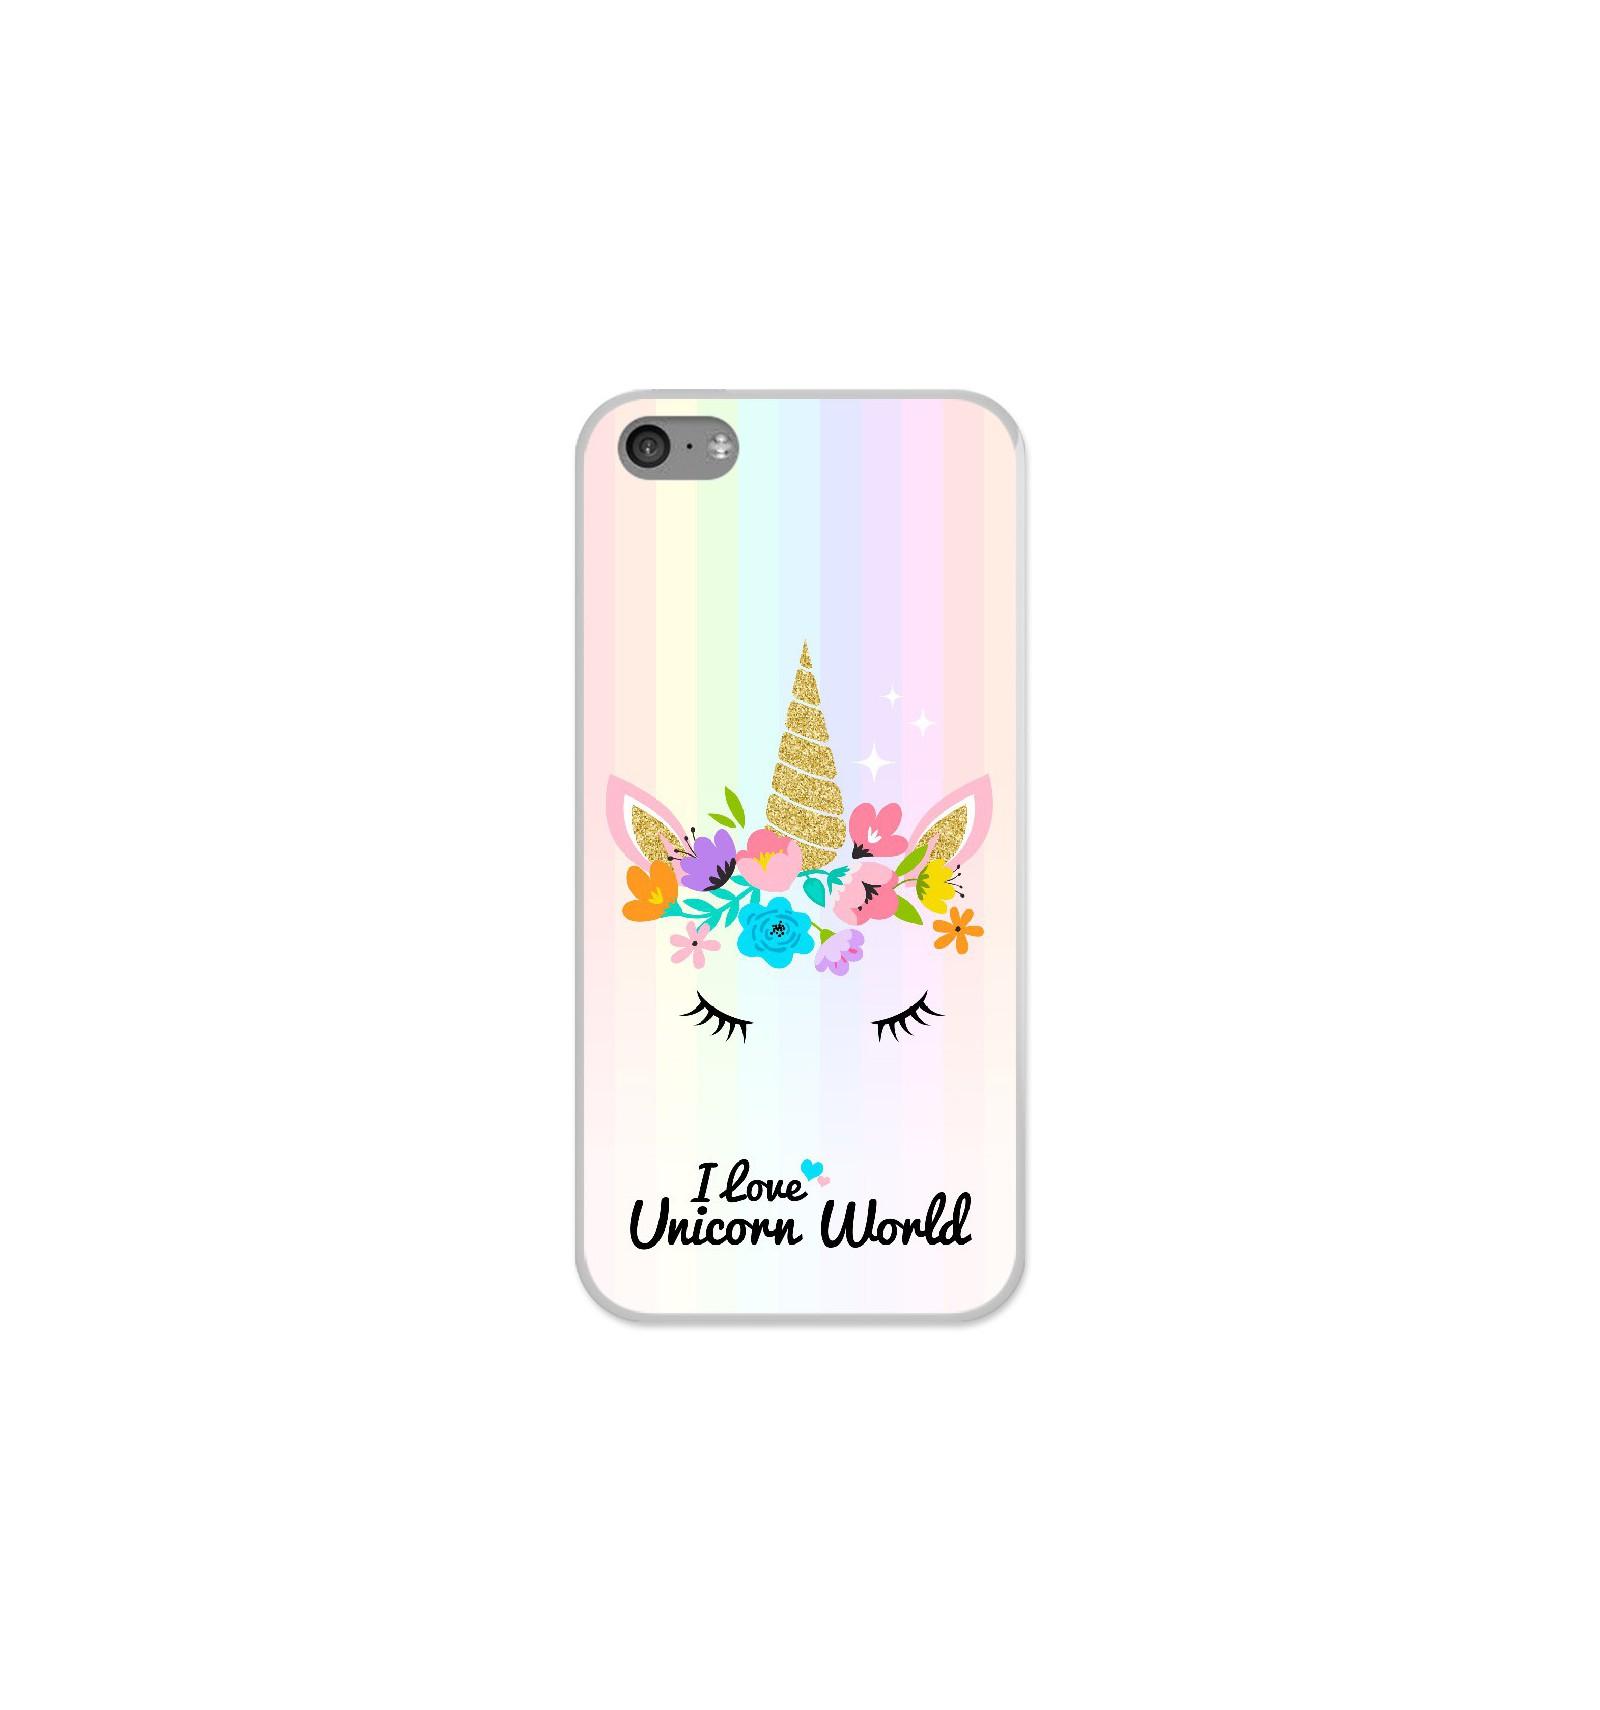 Coque en silicone Apple iPhone 5C - Unicorn World